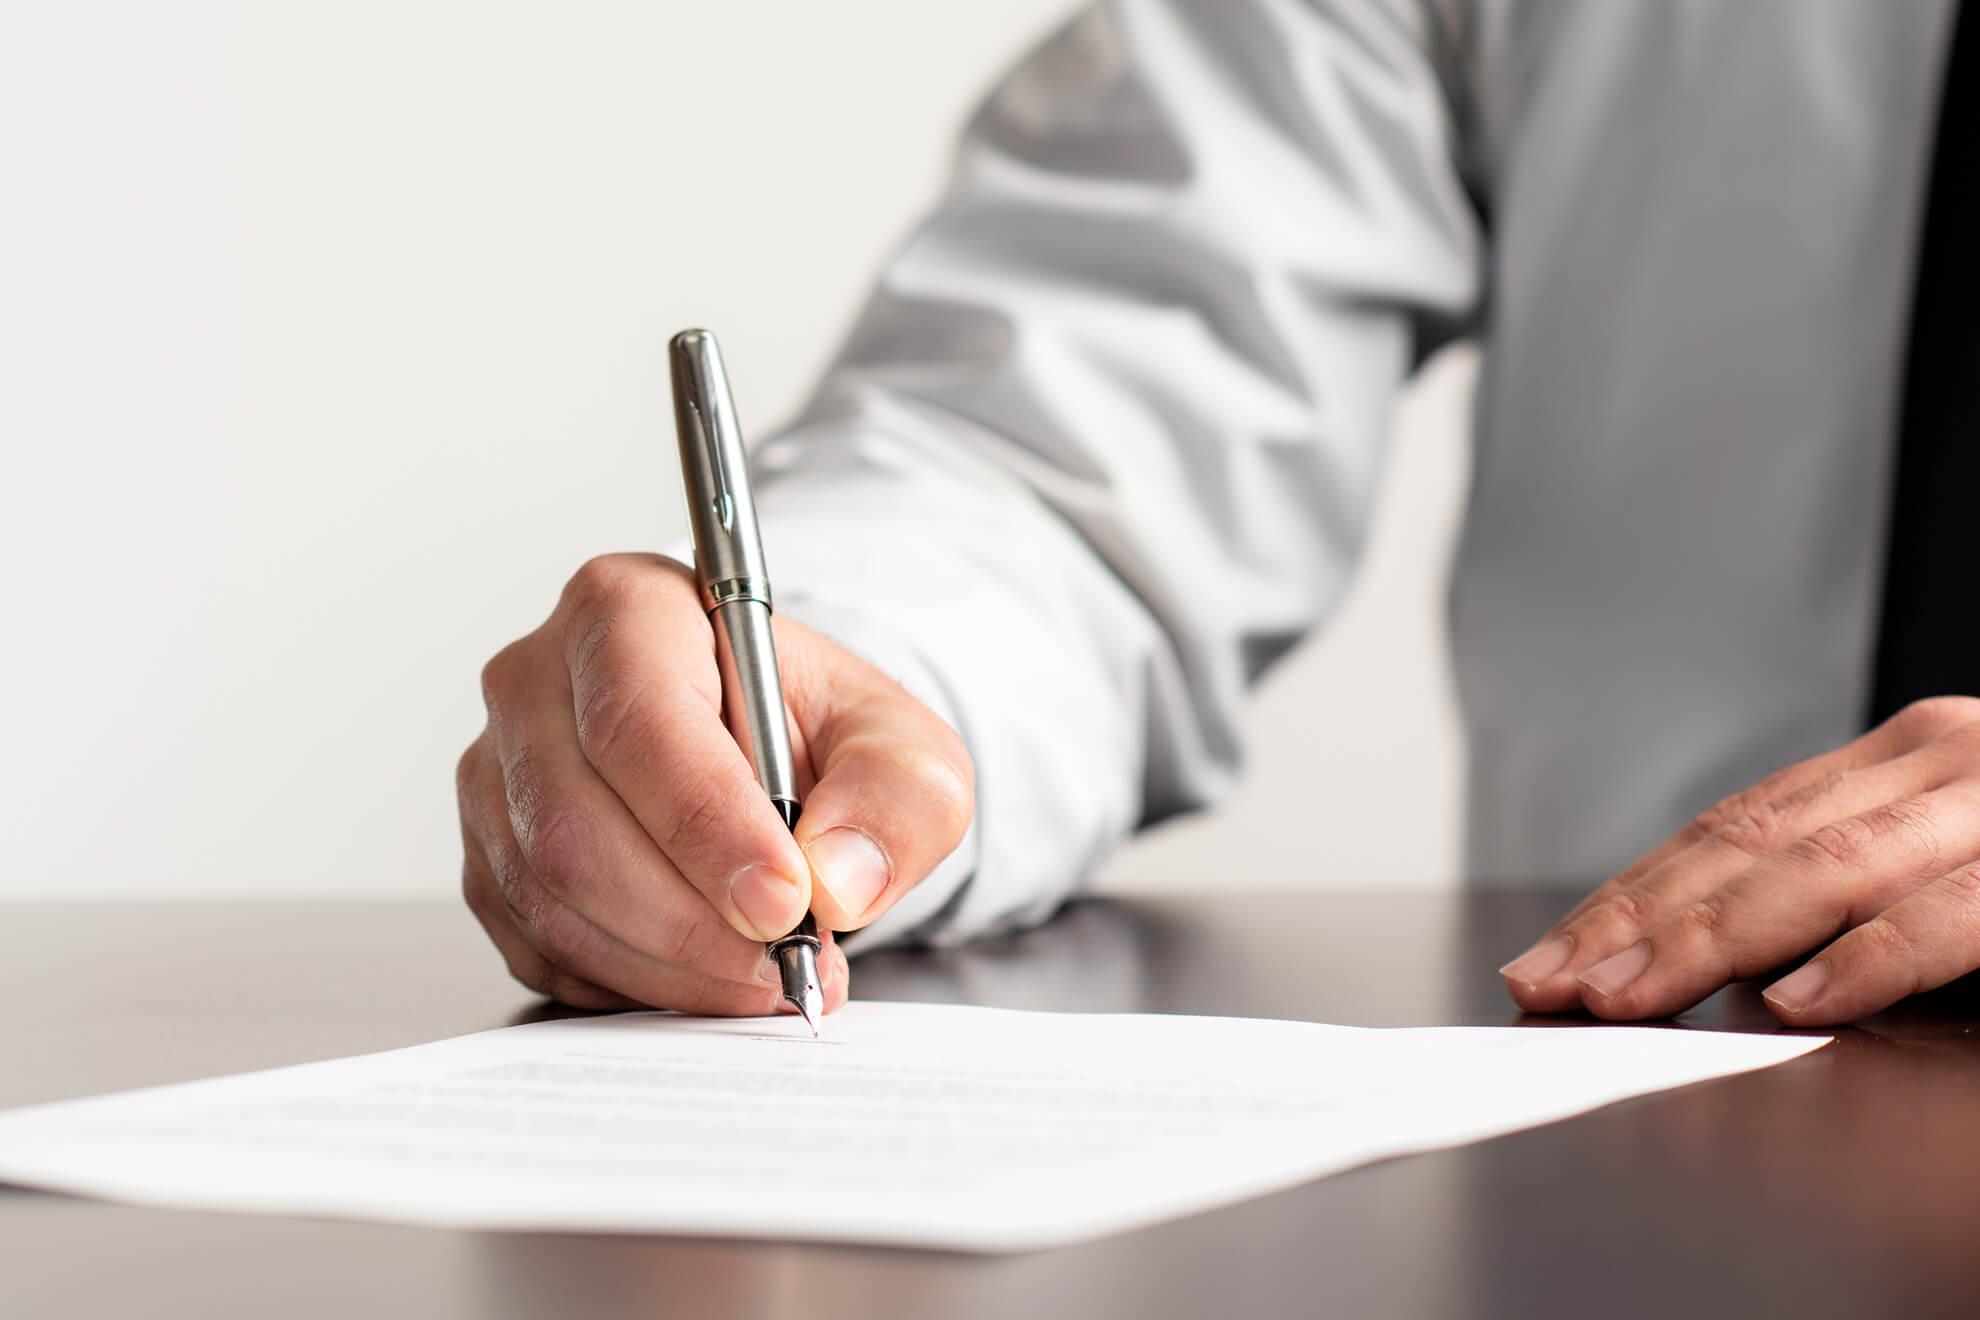 Cambridge Immigration, Work Visa, Skilled Worker, Employer, Sign, Documents